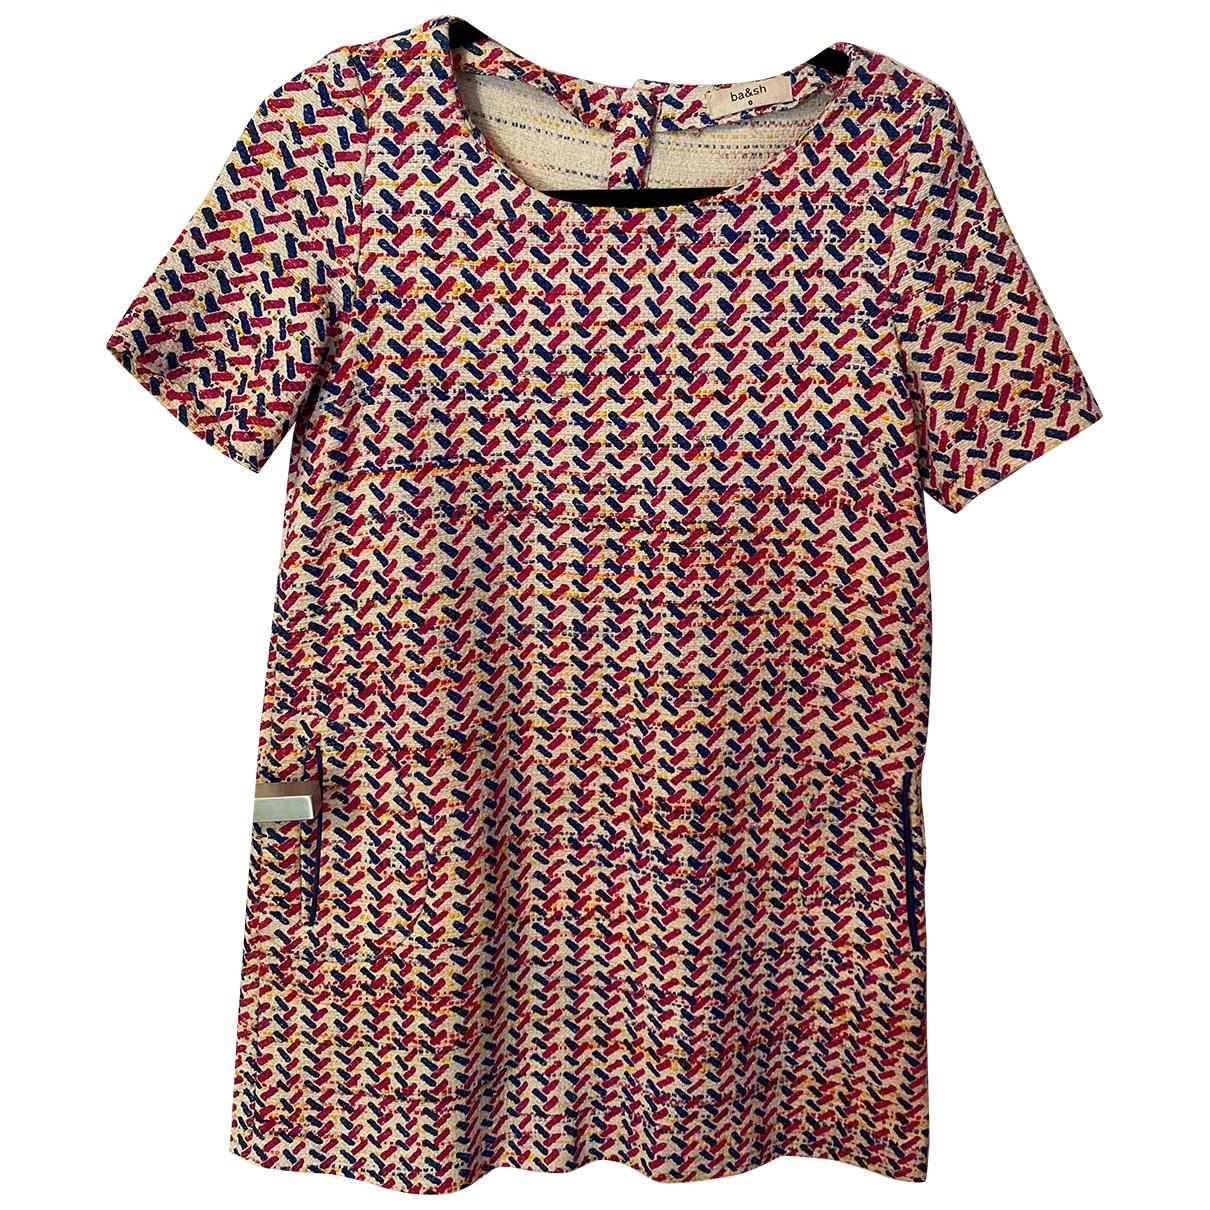 Ba&sh \N Multicolour Cotton dress for Women 0 0-5